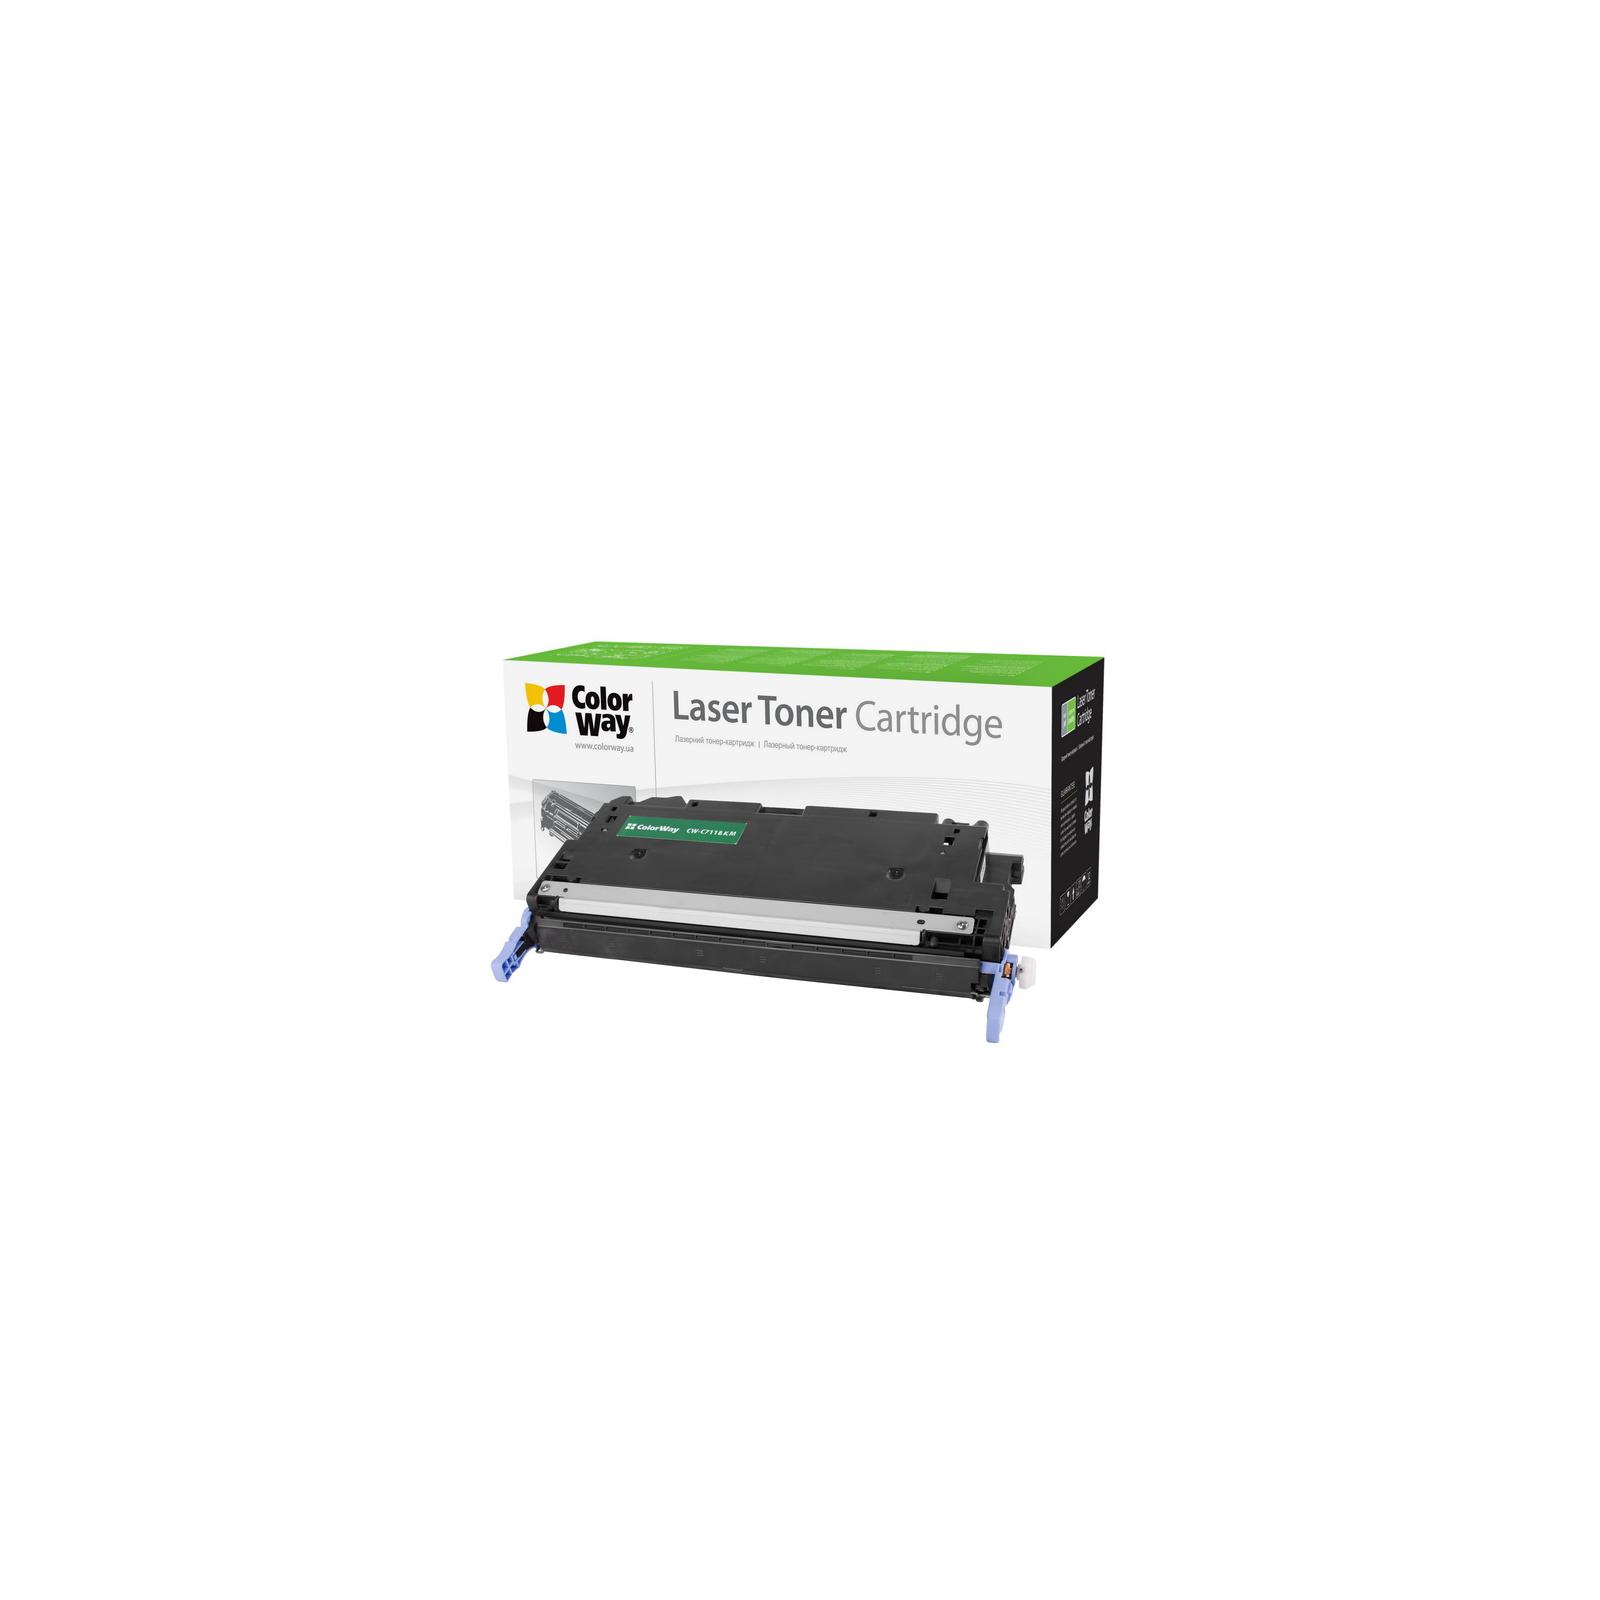 Картридж ColorWay для CANON 711 (HP Q6470A) LBP-5300/5360 black (CW-C711BKM)